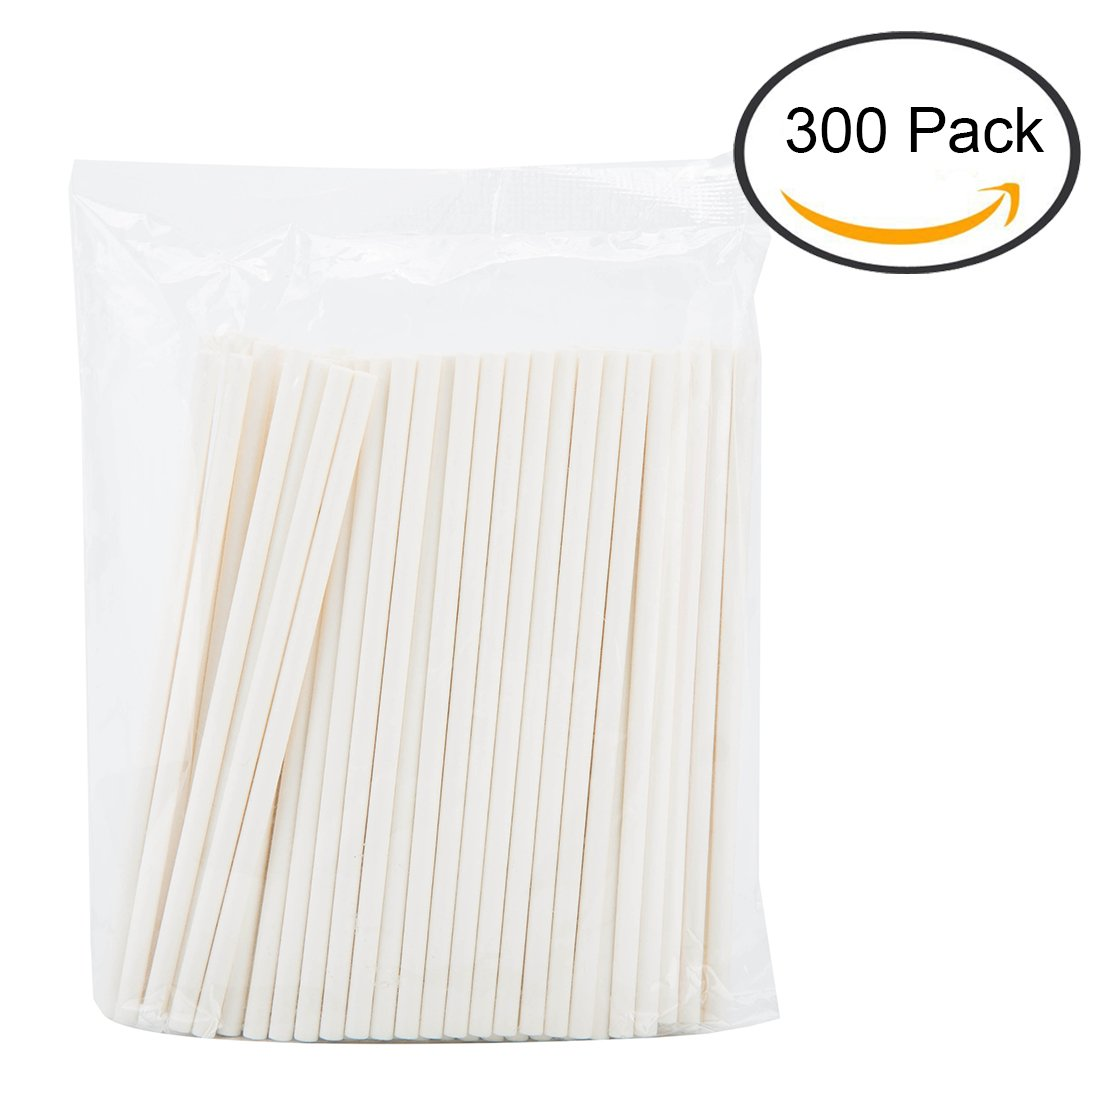 275f0a4c6b4 Get Quotations · Tosnail 4-Inch Lollipop Sticks Cake Pop Sticks - 300 Pack